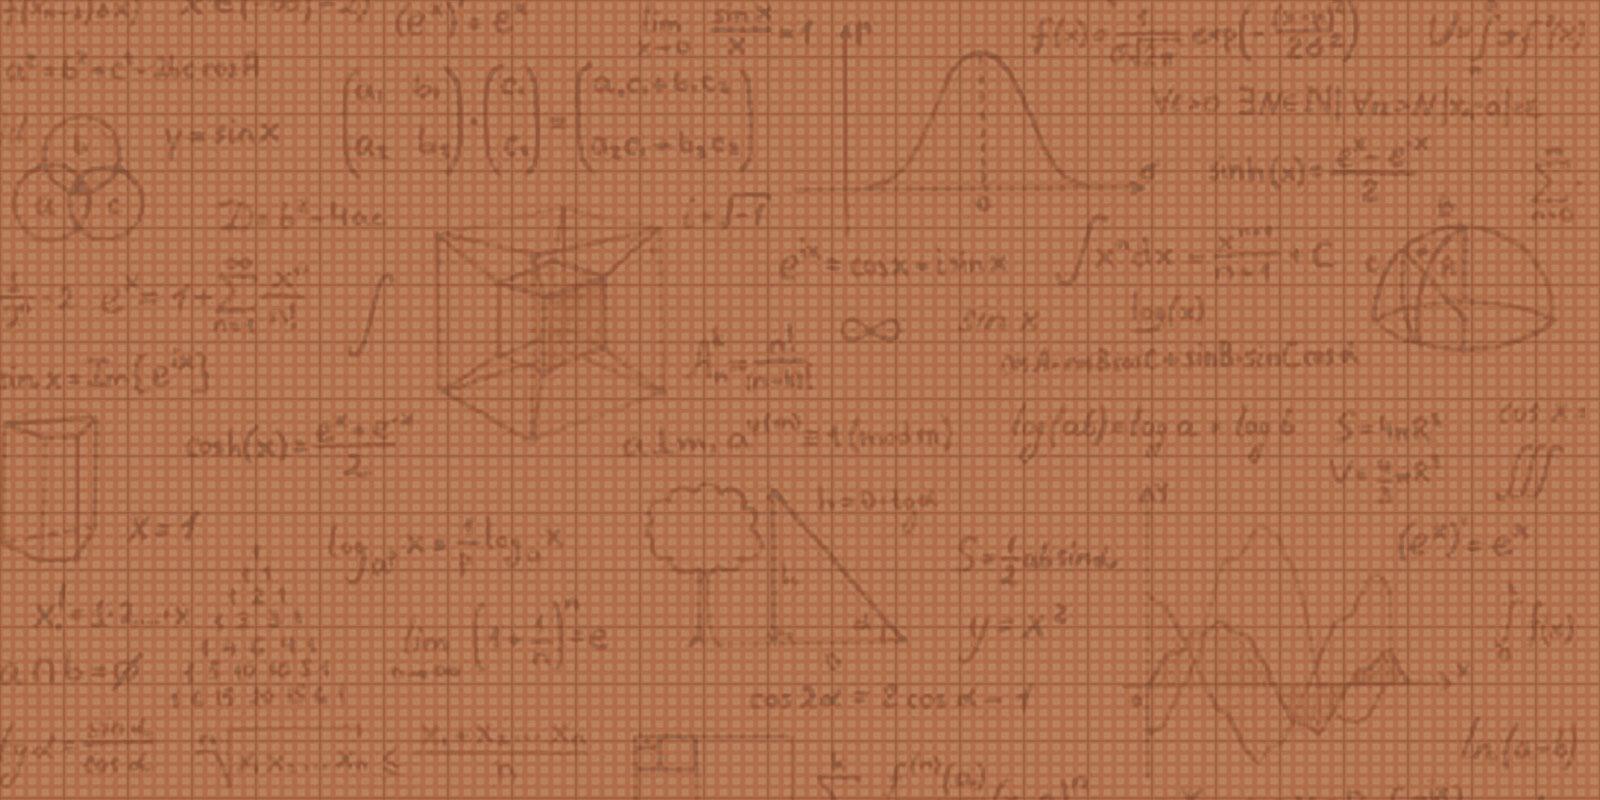 Vector math hero image